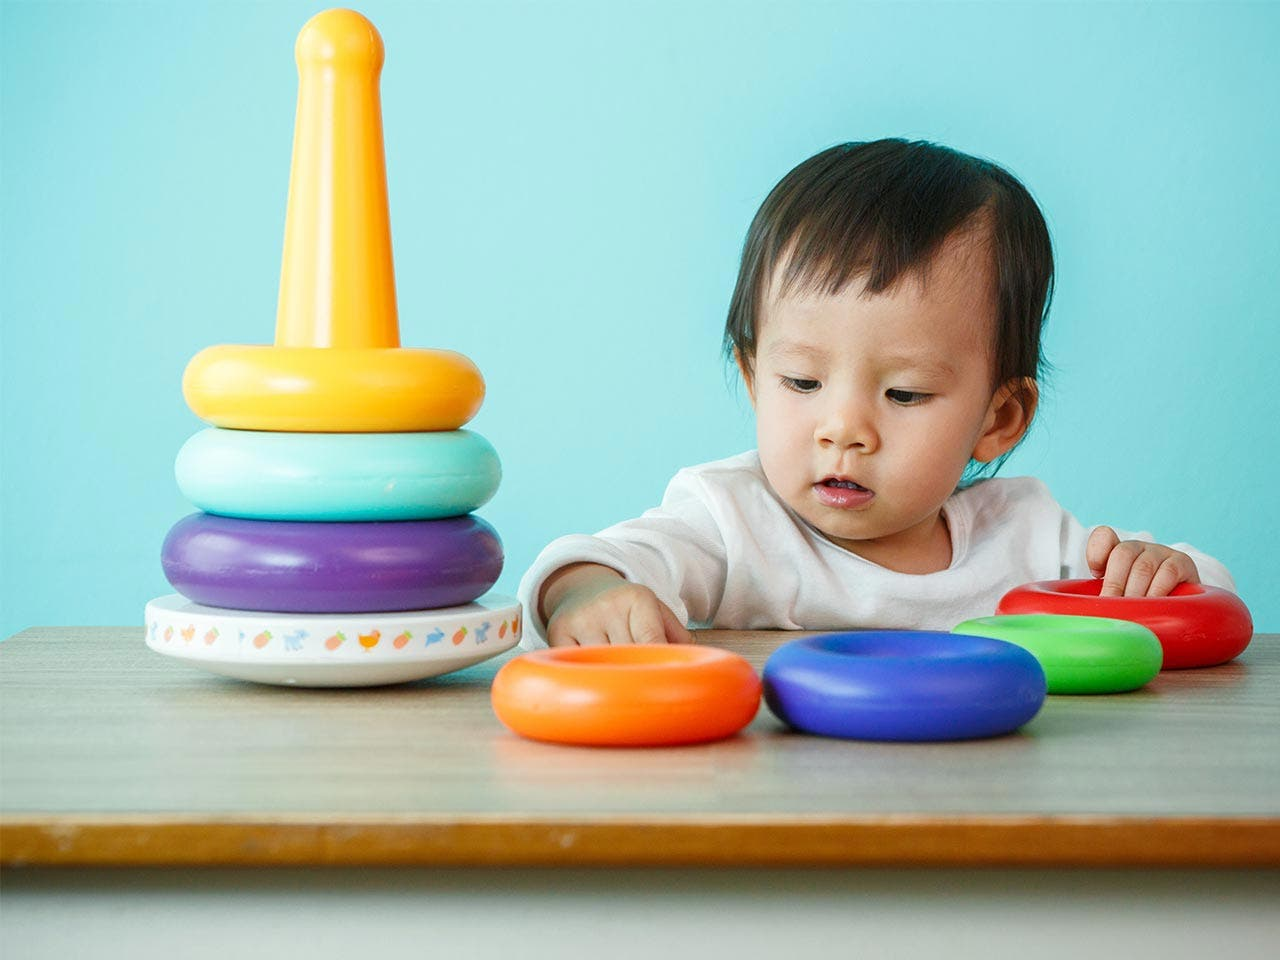 Toys | DONOT6_STUDIO/Shutterstock.com